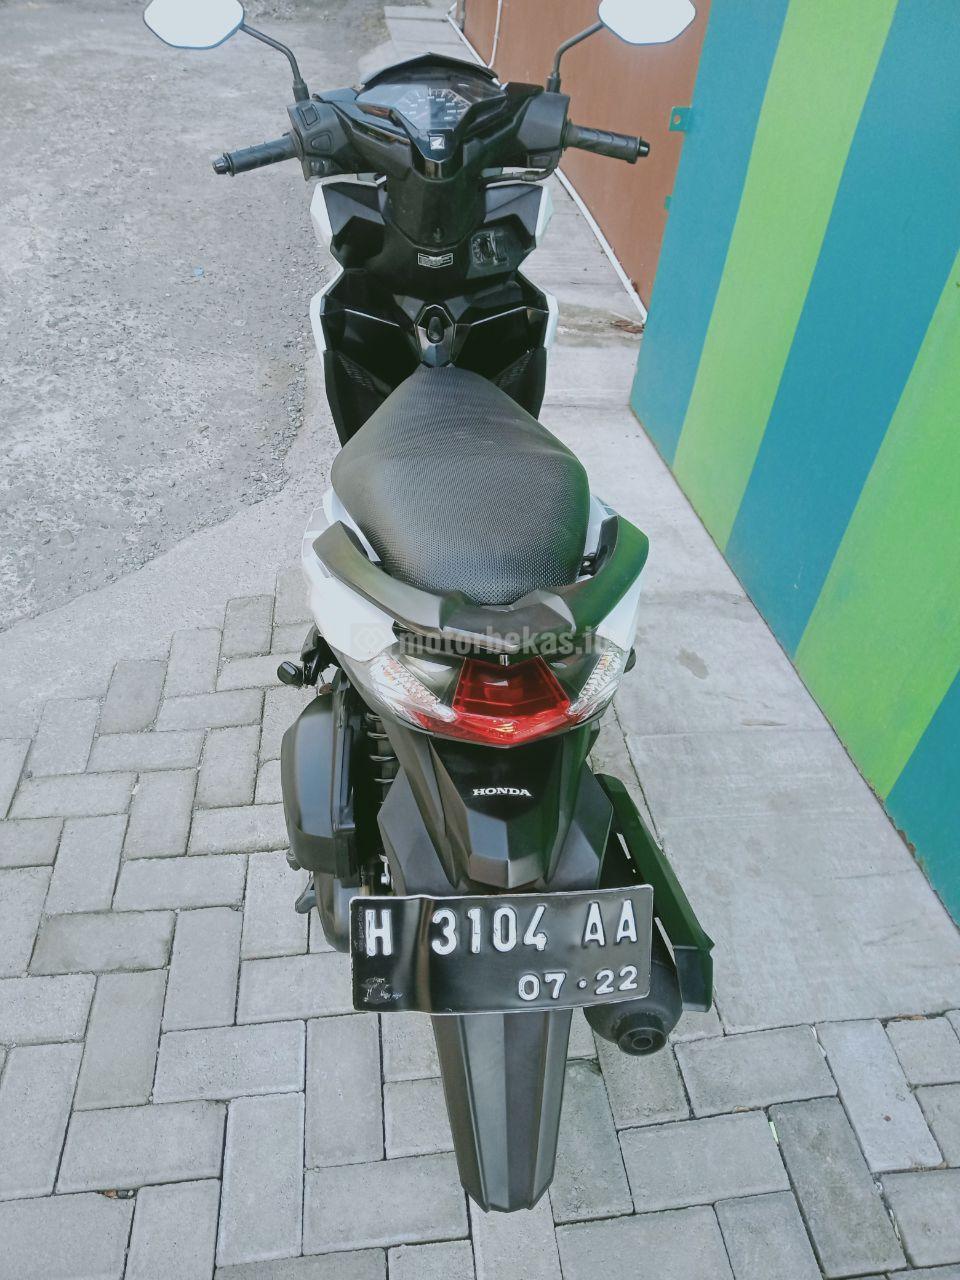 HONDA VARIO 125 FI 4120 motorbekas.id